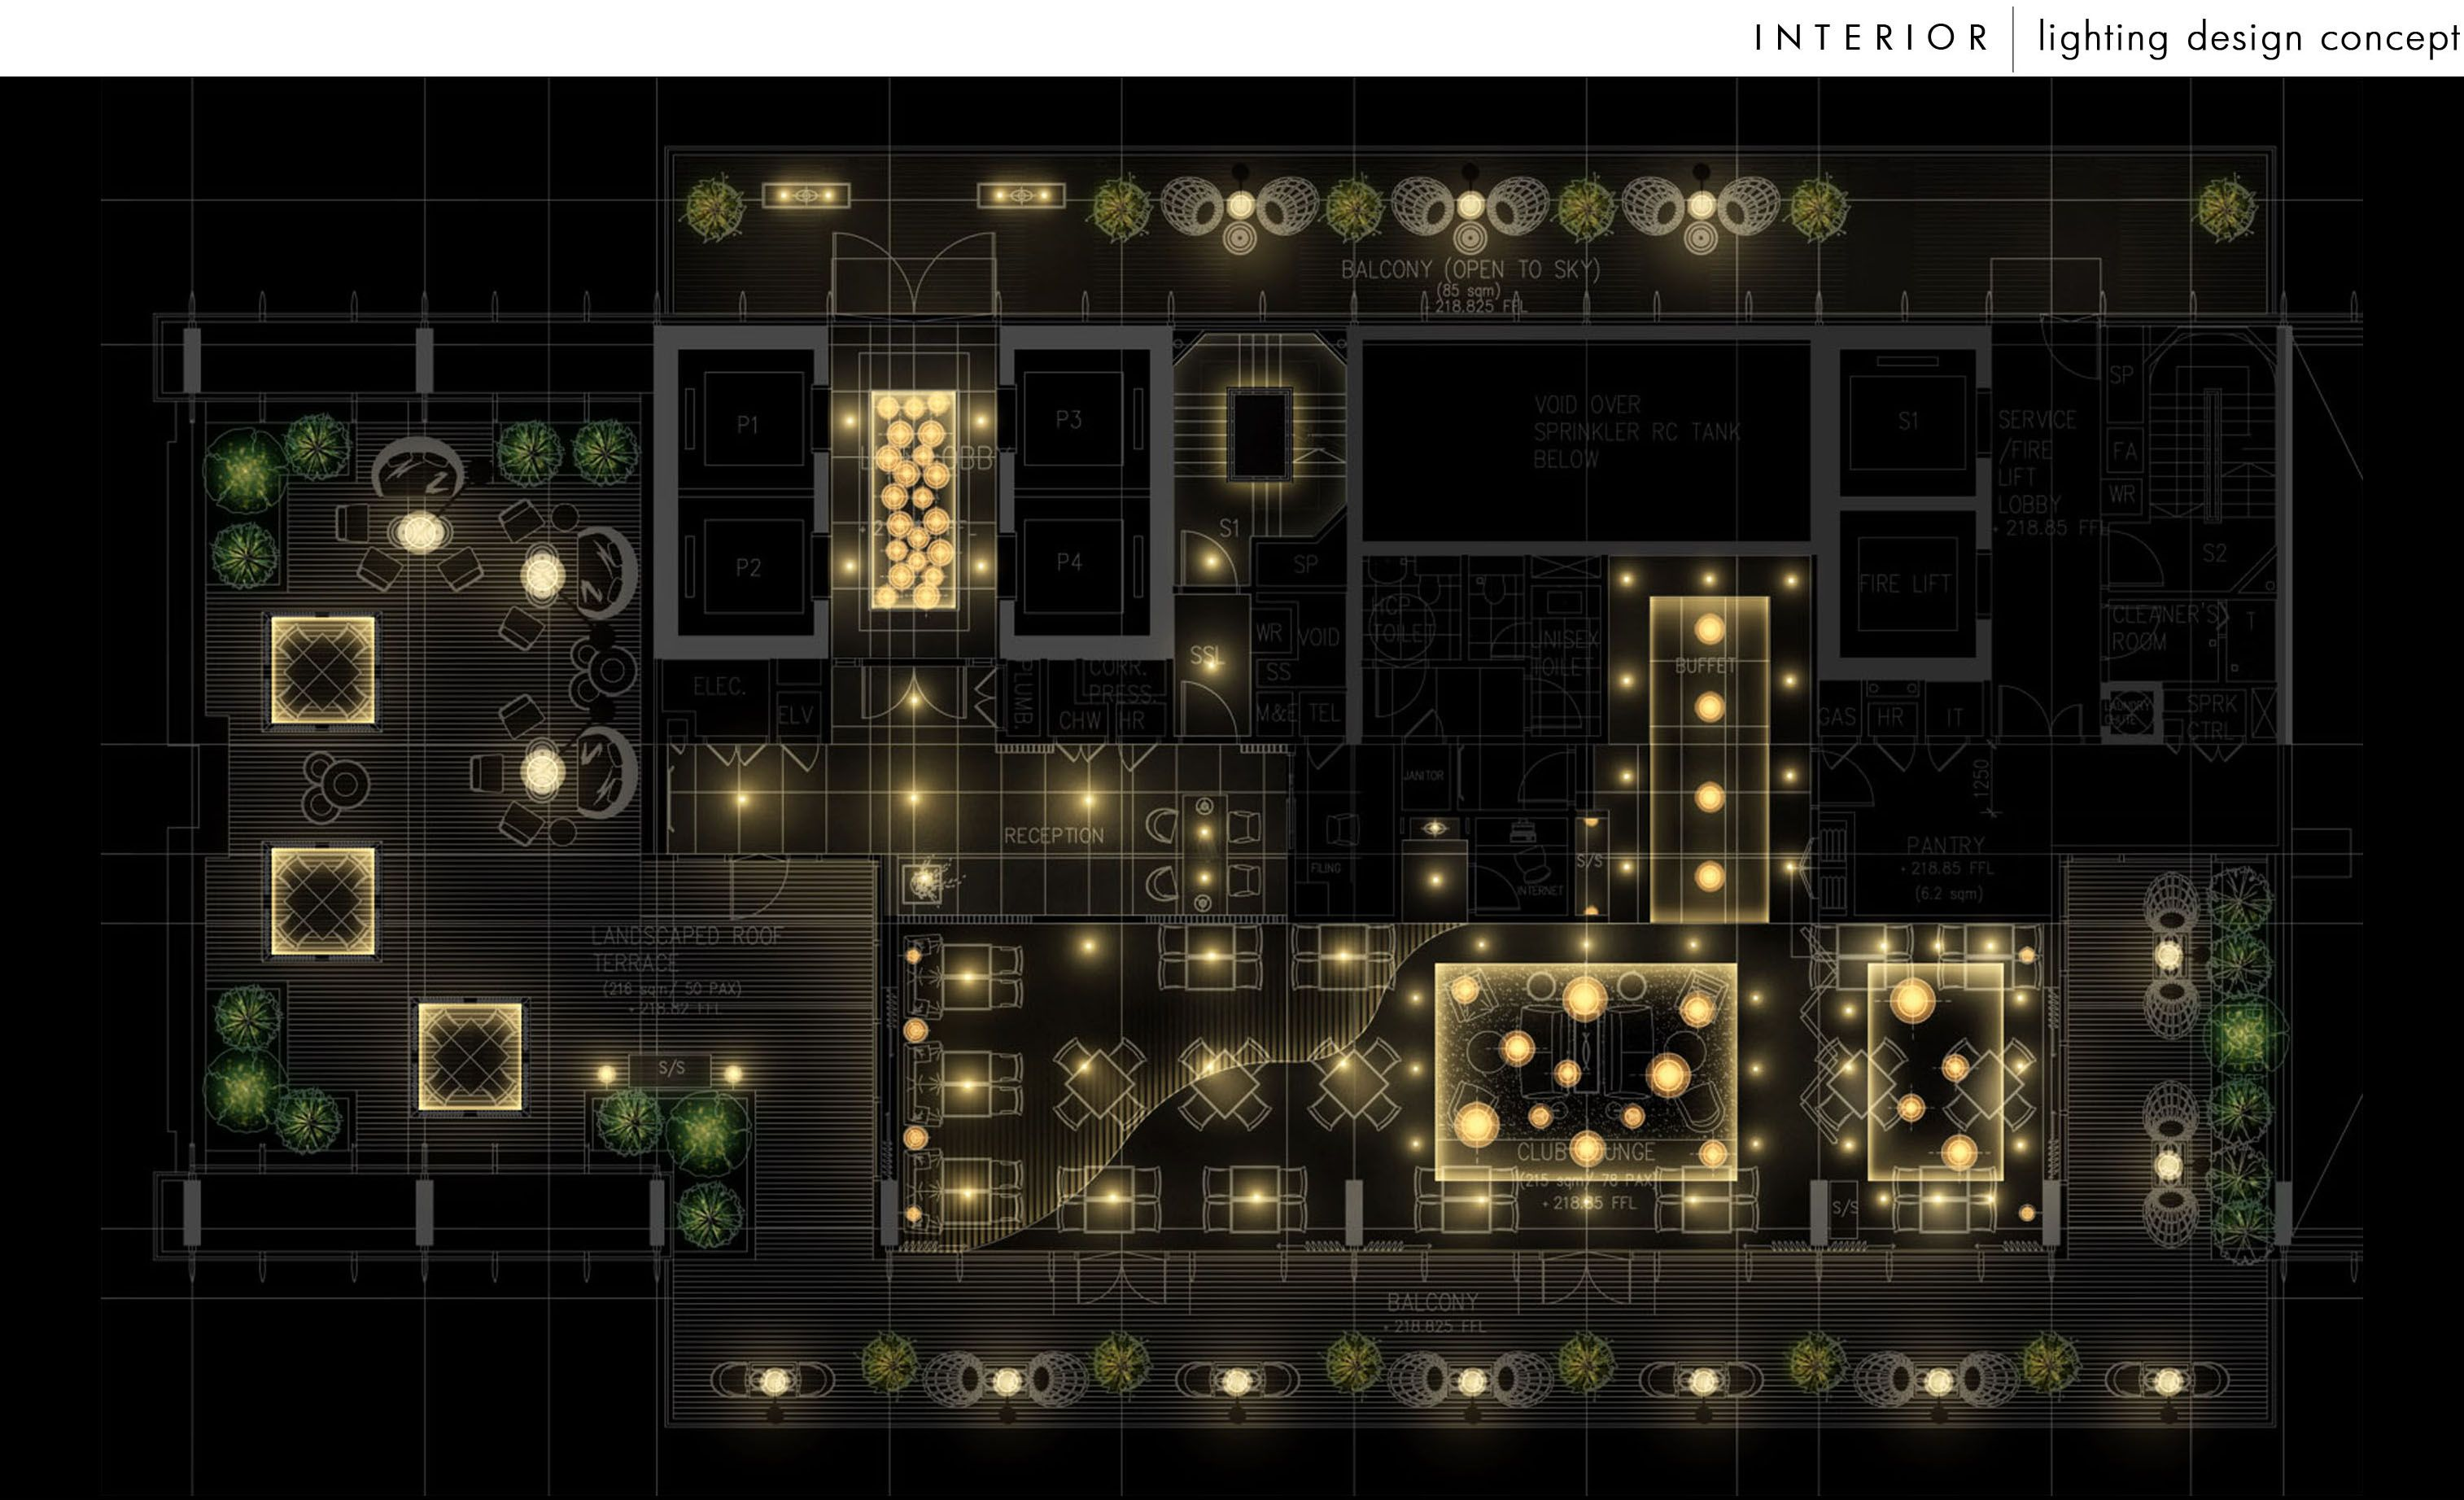 Commercial interior lighting design under corporate for Interior lighting design